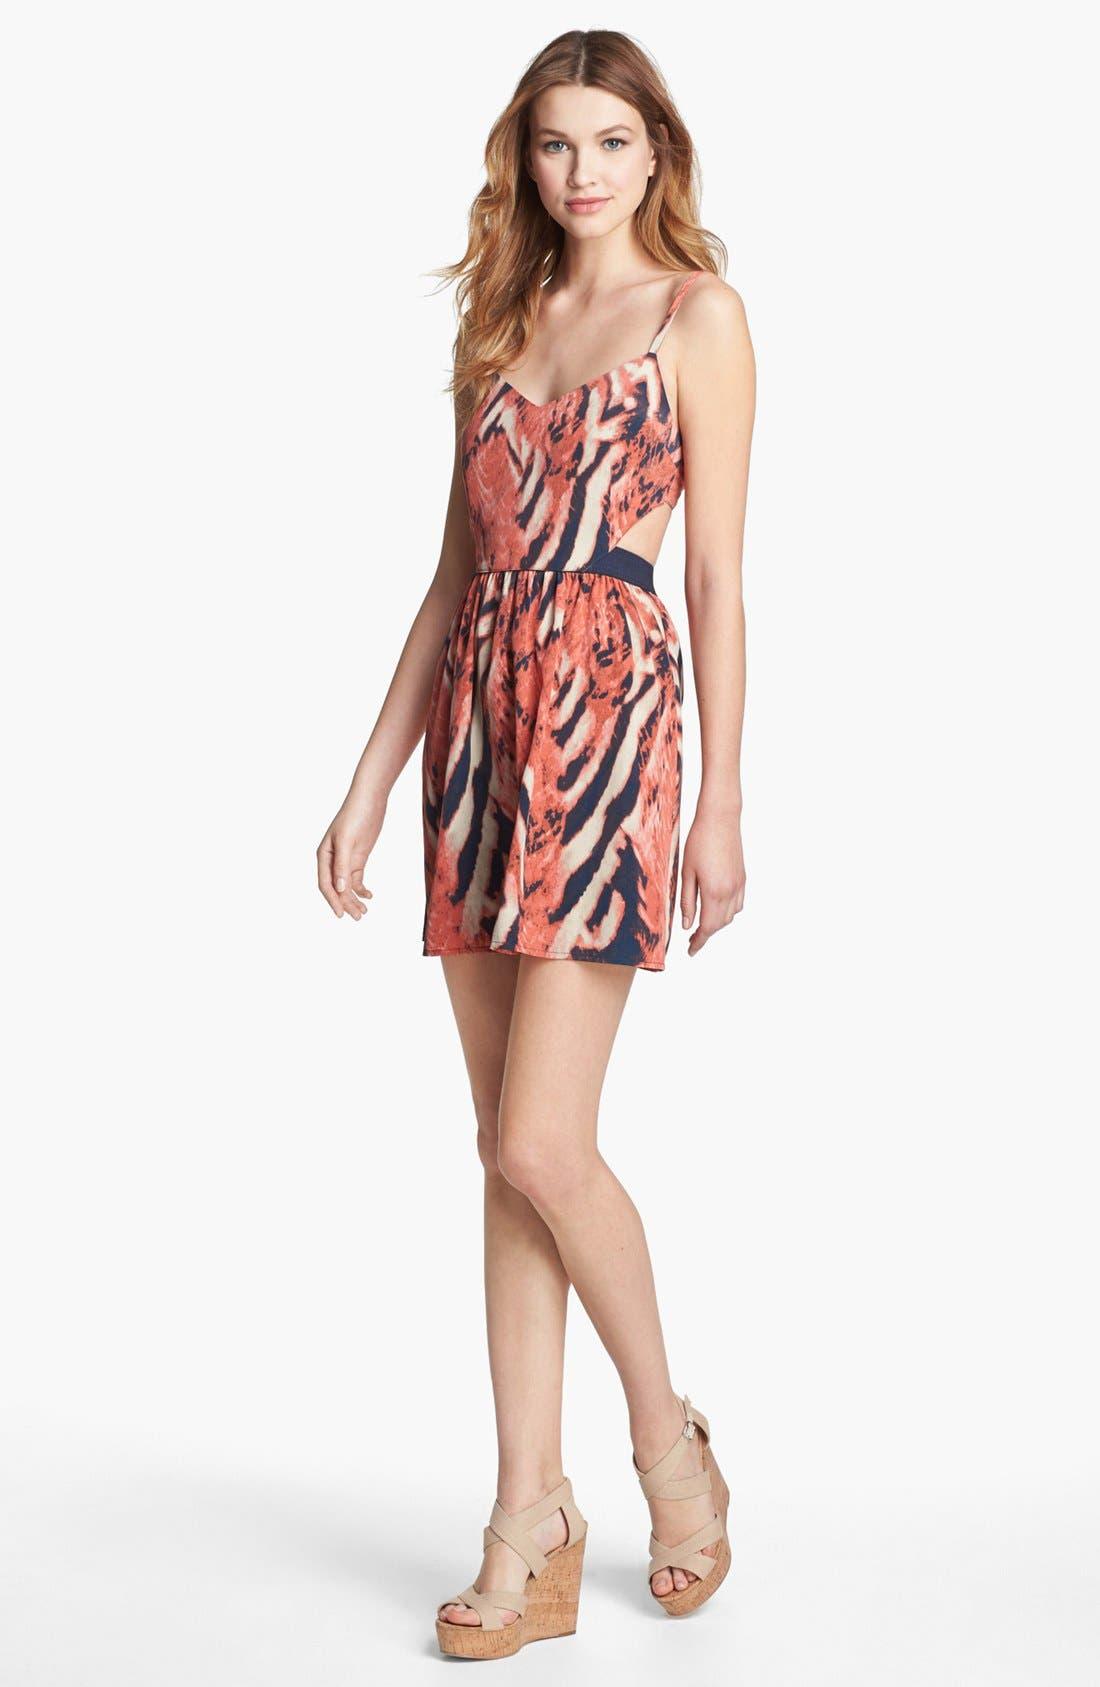 Alternate Image 1 Selected - BB Dakota 'Bengal' Print Cutout Back Dress